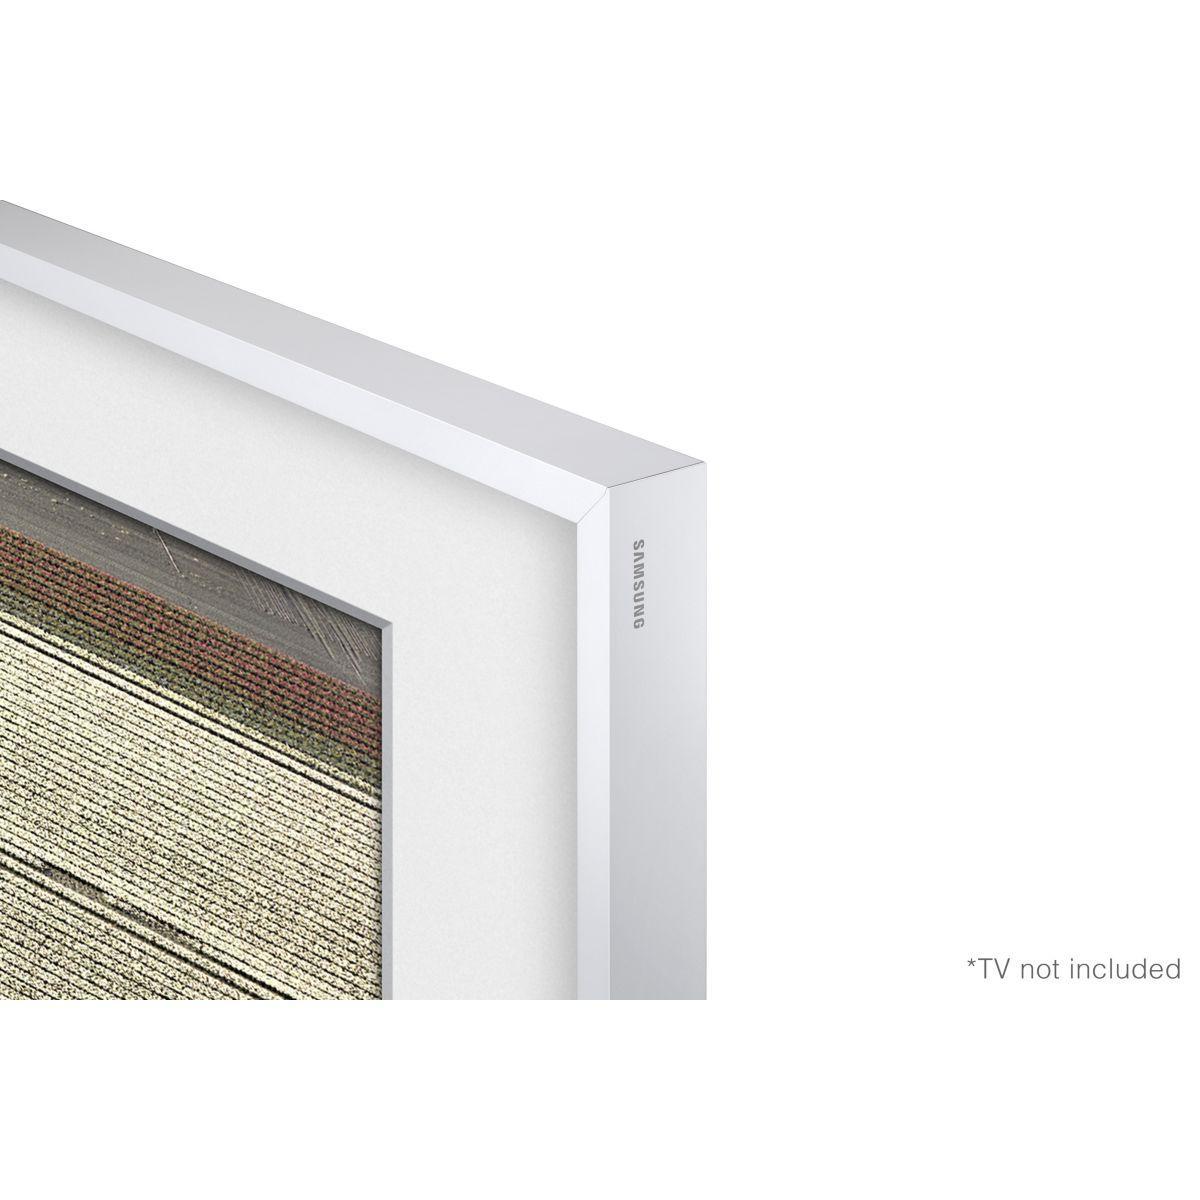 Cadre the frame samsung cadre vg-scfm65wm the frame white - 15% de remise imm�diate avec le code : fete15 (photo)